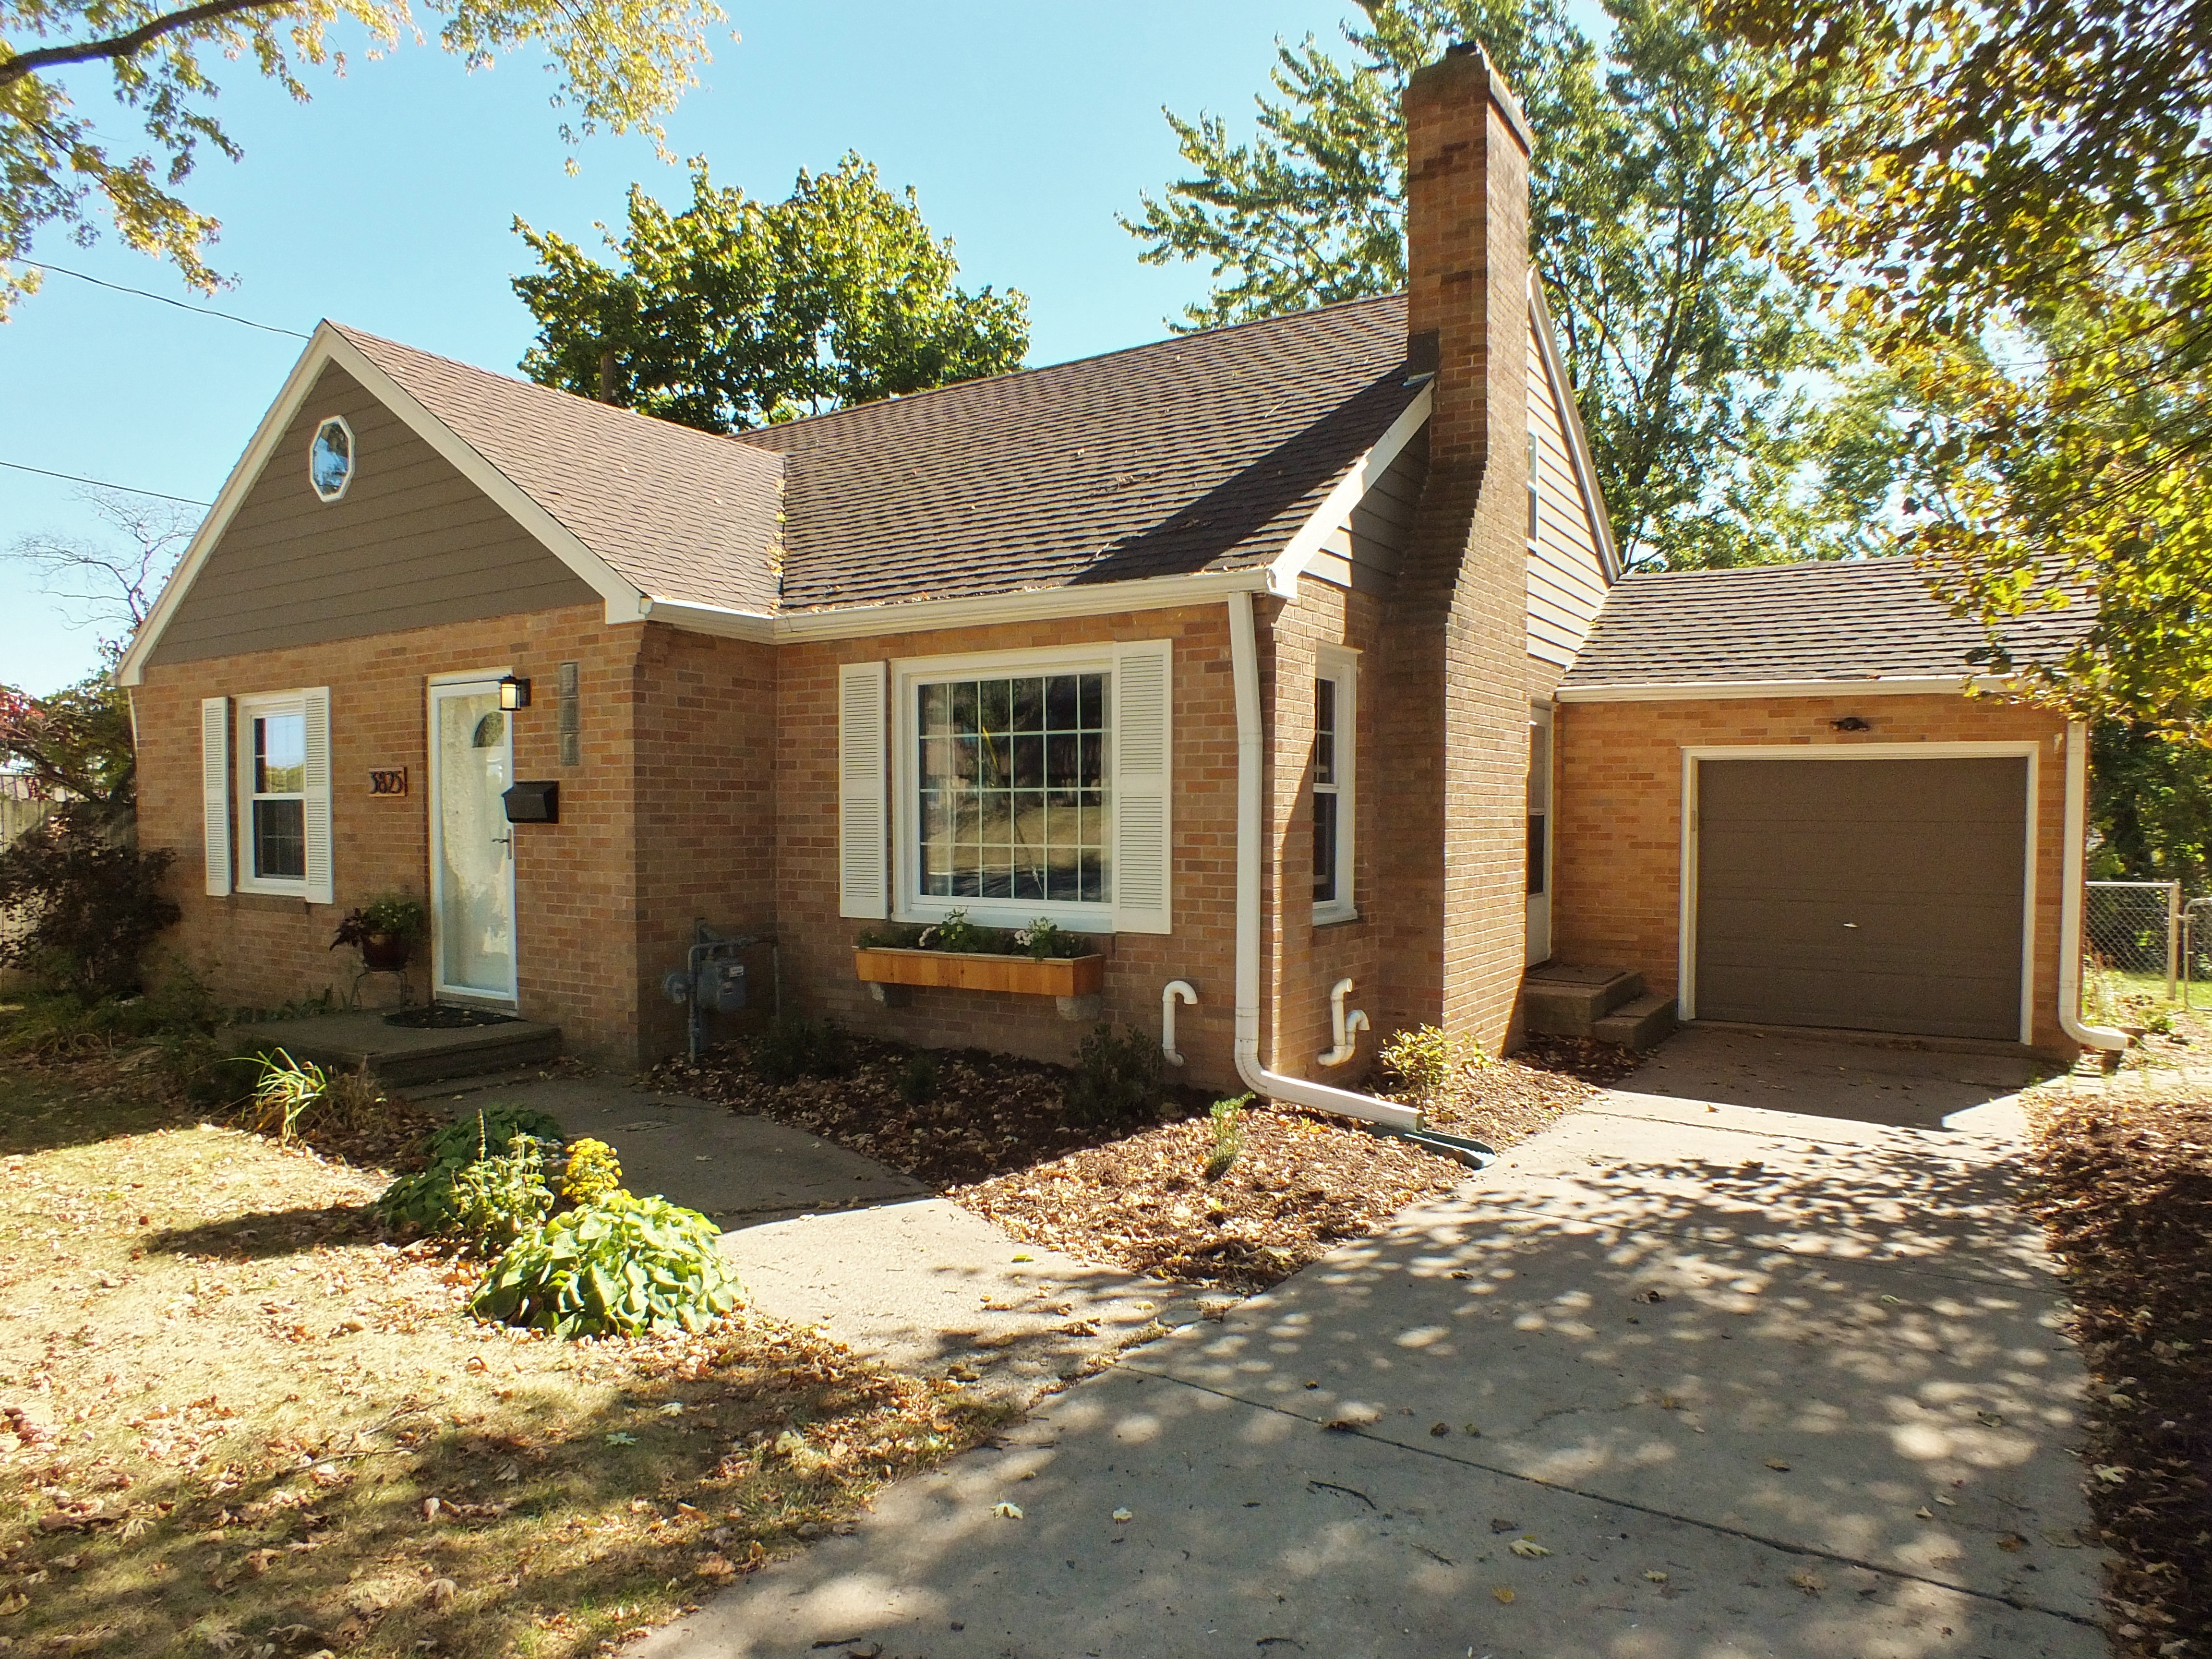 Madison WI Homes For Sale - Alvarado Real Estate Group